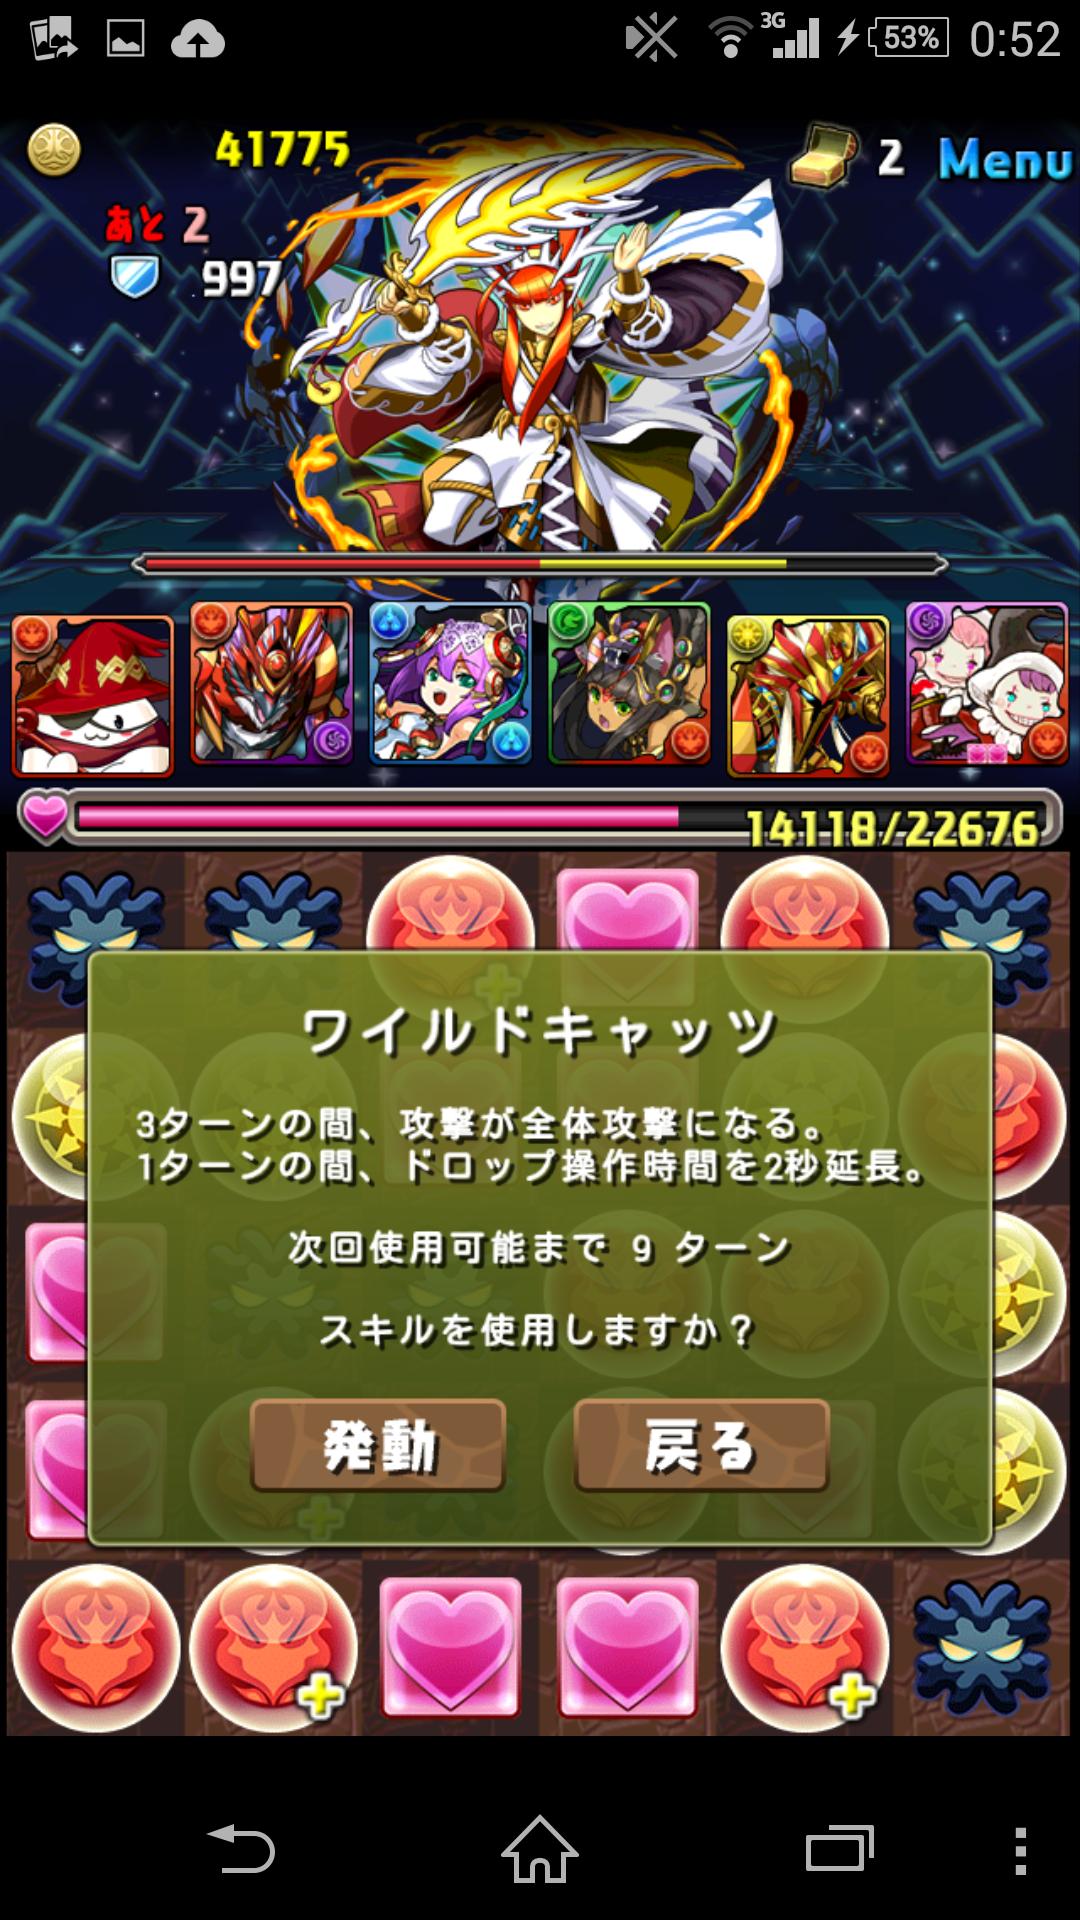 Screenshot_2015-04-10-00-52-29.png